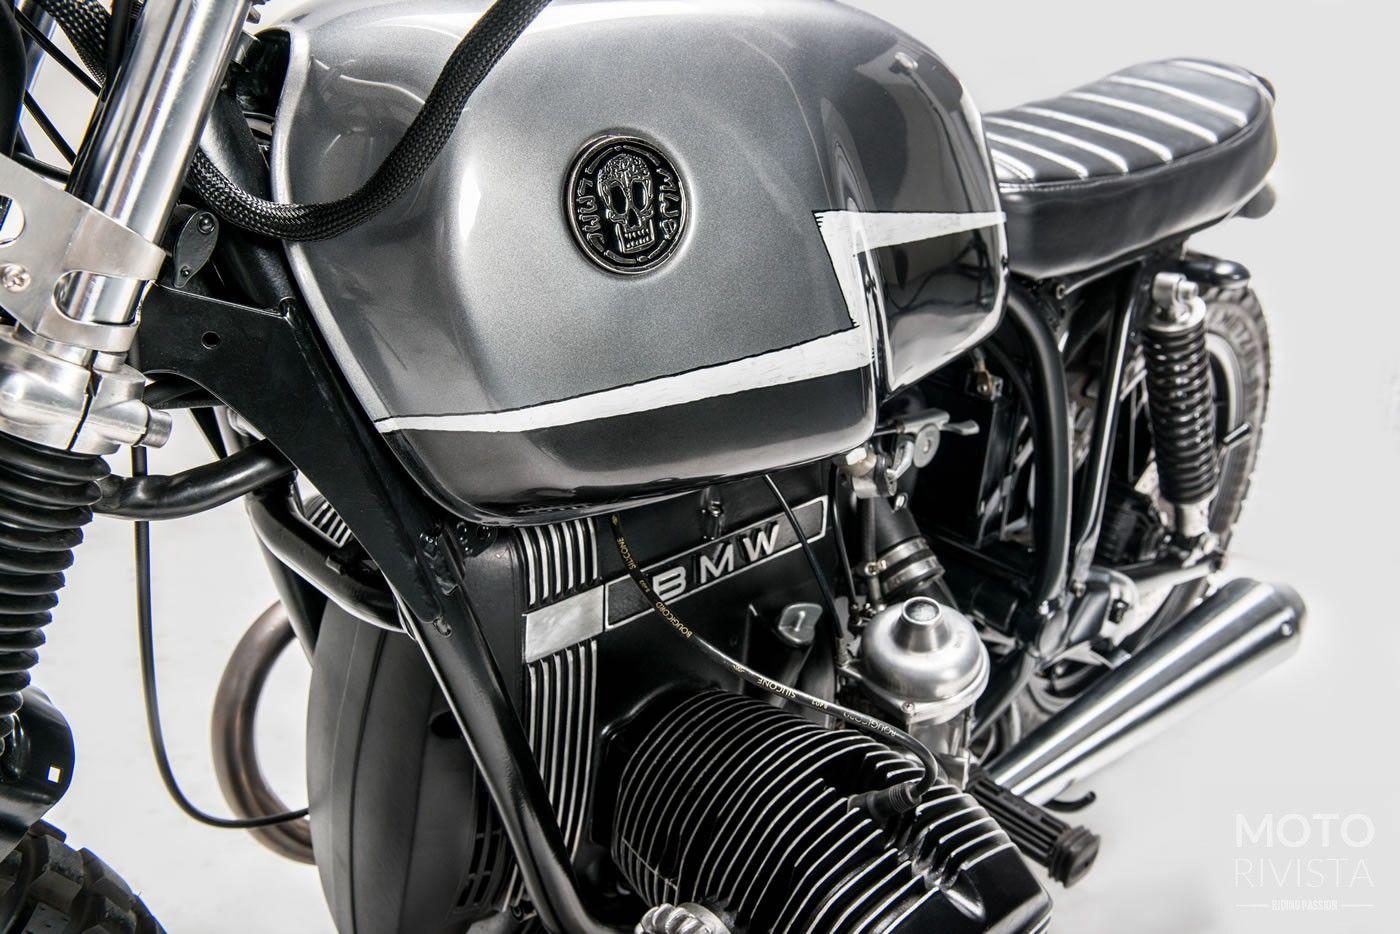 BMW R100RT engine